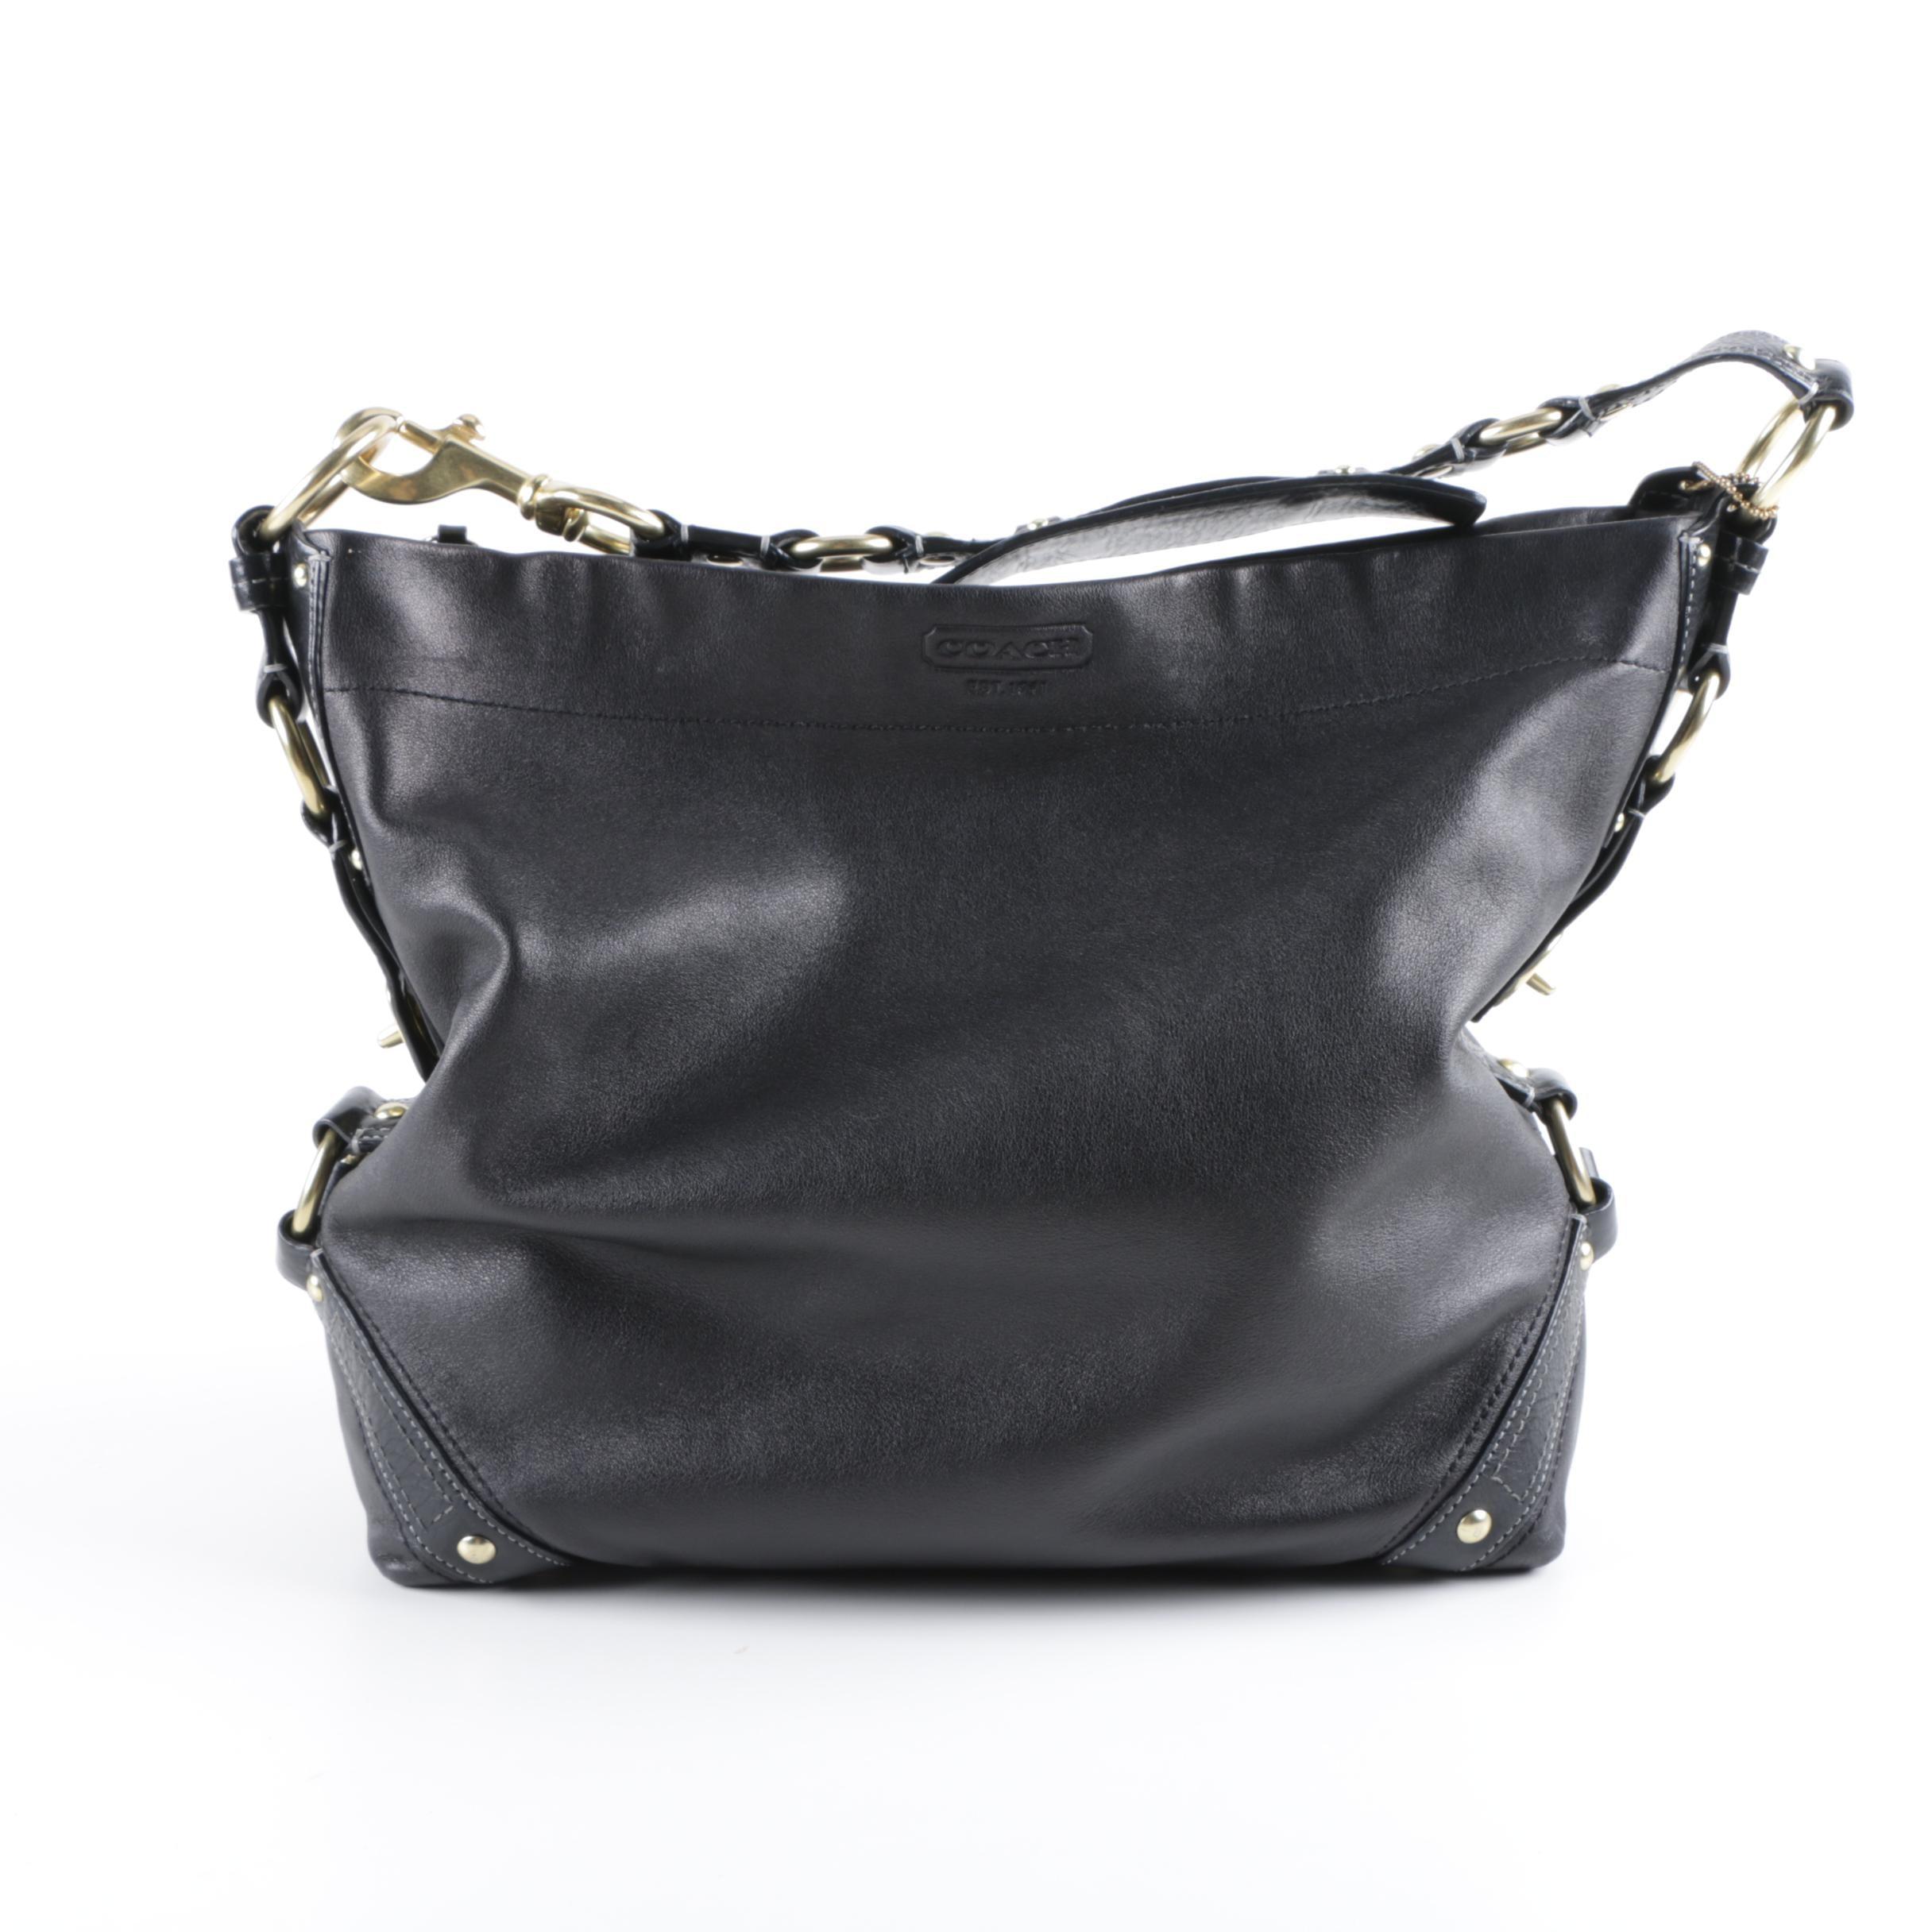 Coach Carly Black Leather Hobo Bag